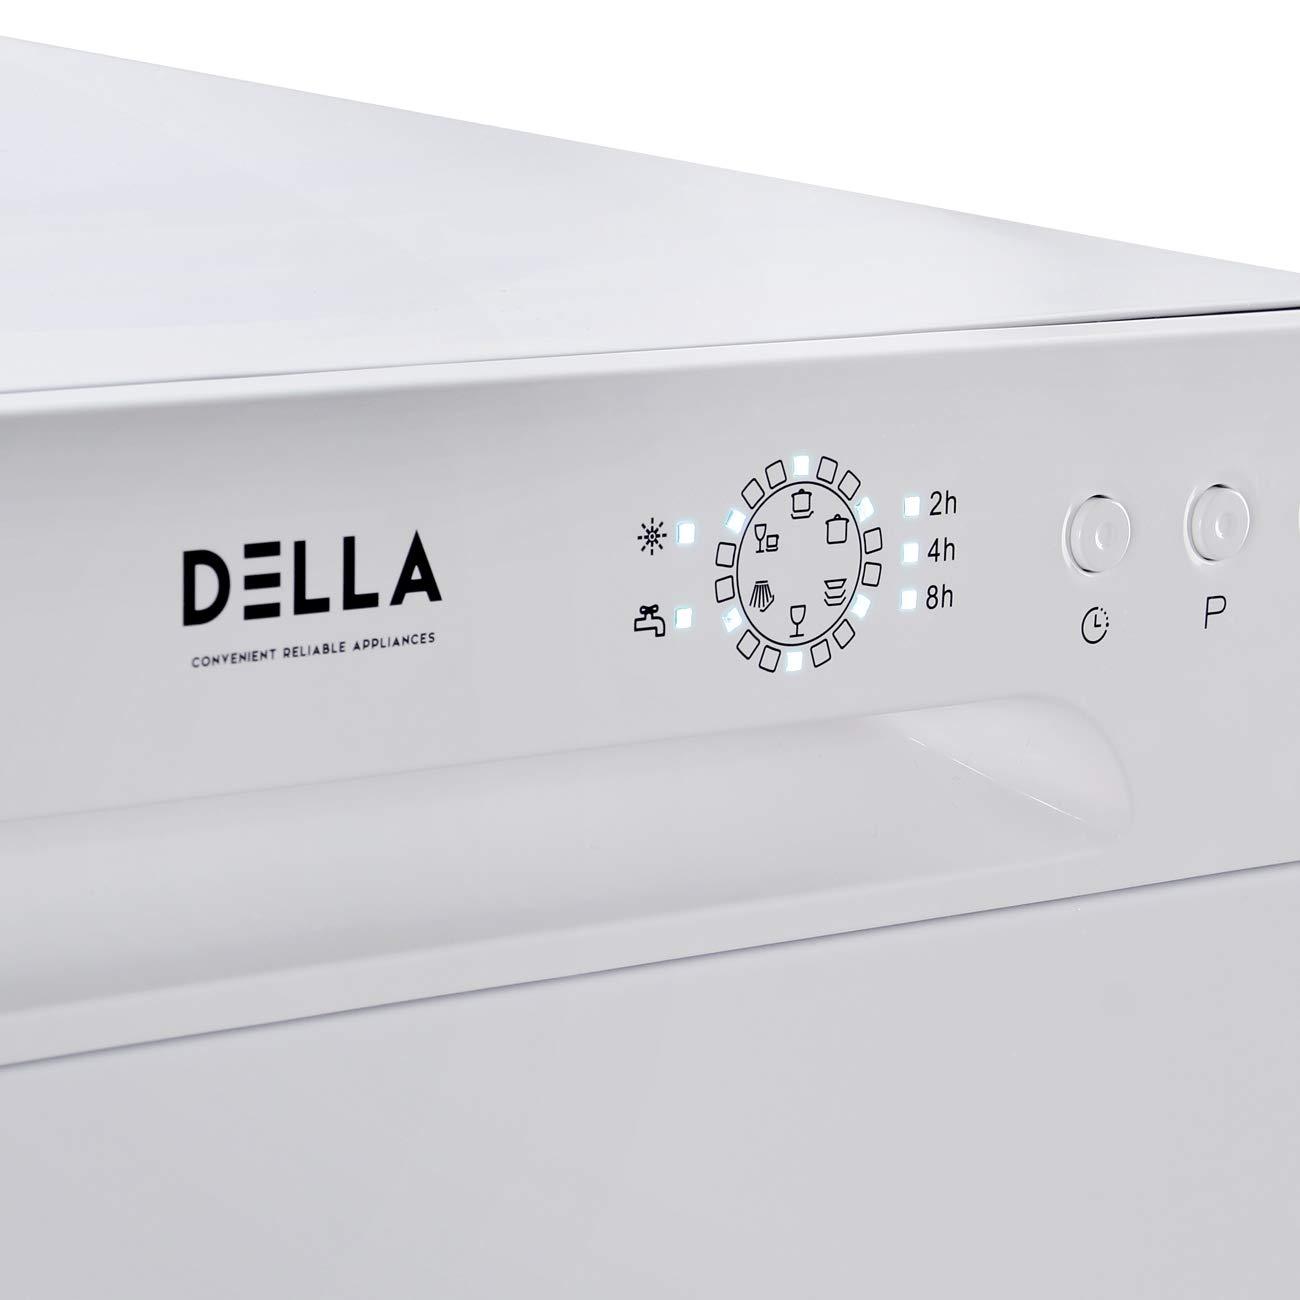 White DELLA Mini Compact Countertop Dishwasher 6 Place Settings Portable For Small Apartment Home Kitchen